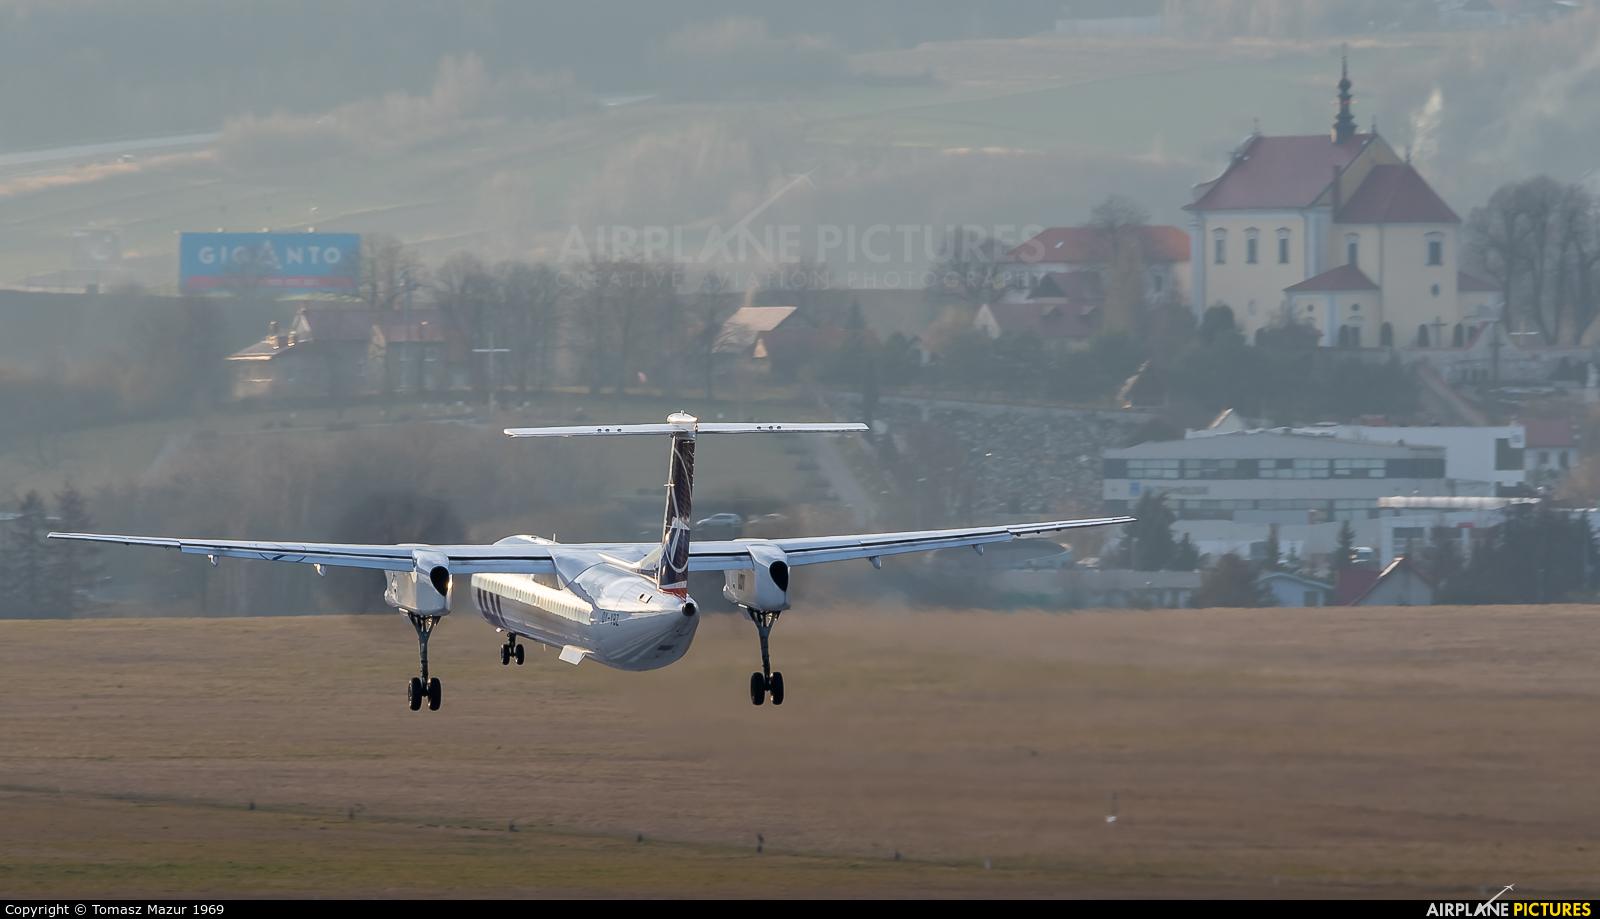 LOT - Polish Airlines OY-YBZ aircraft at Kraków - John Paul II Intl